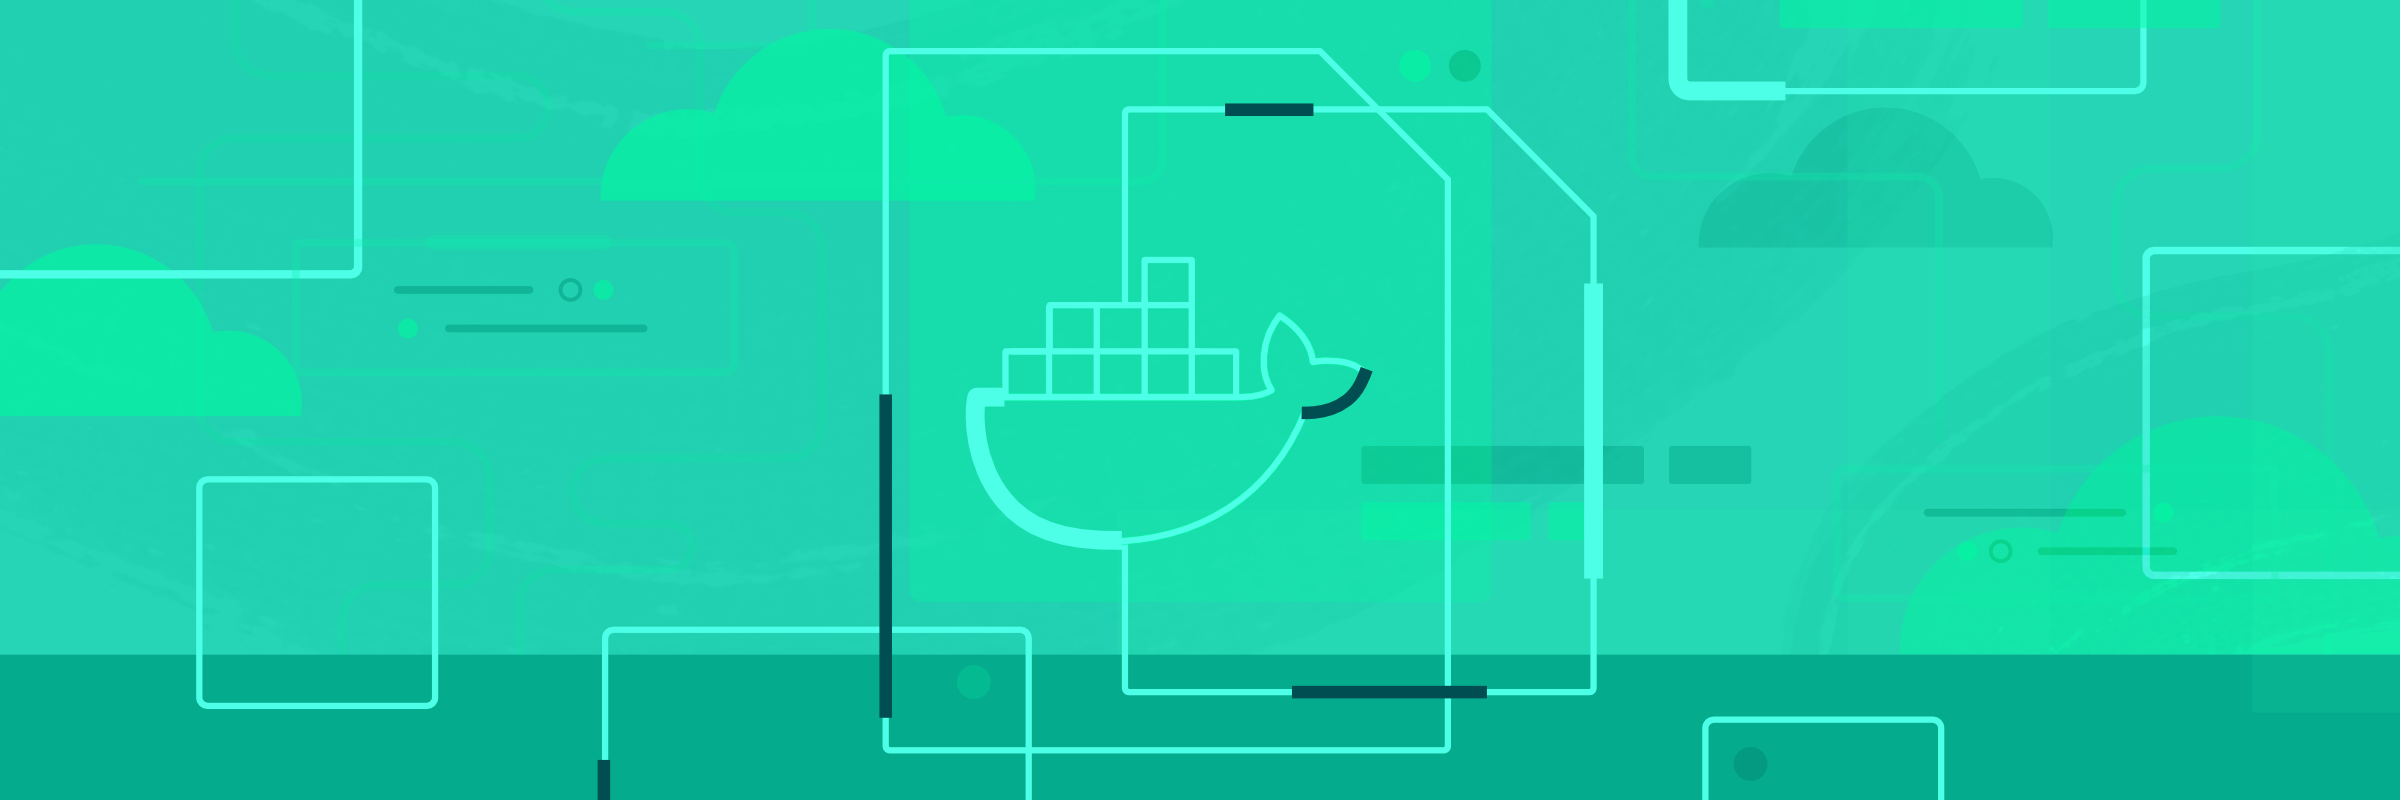 Optimizing Dockerfile for Node.js (Part 1)